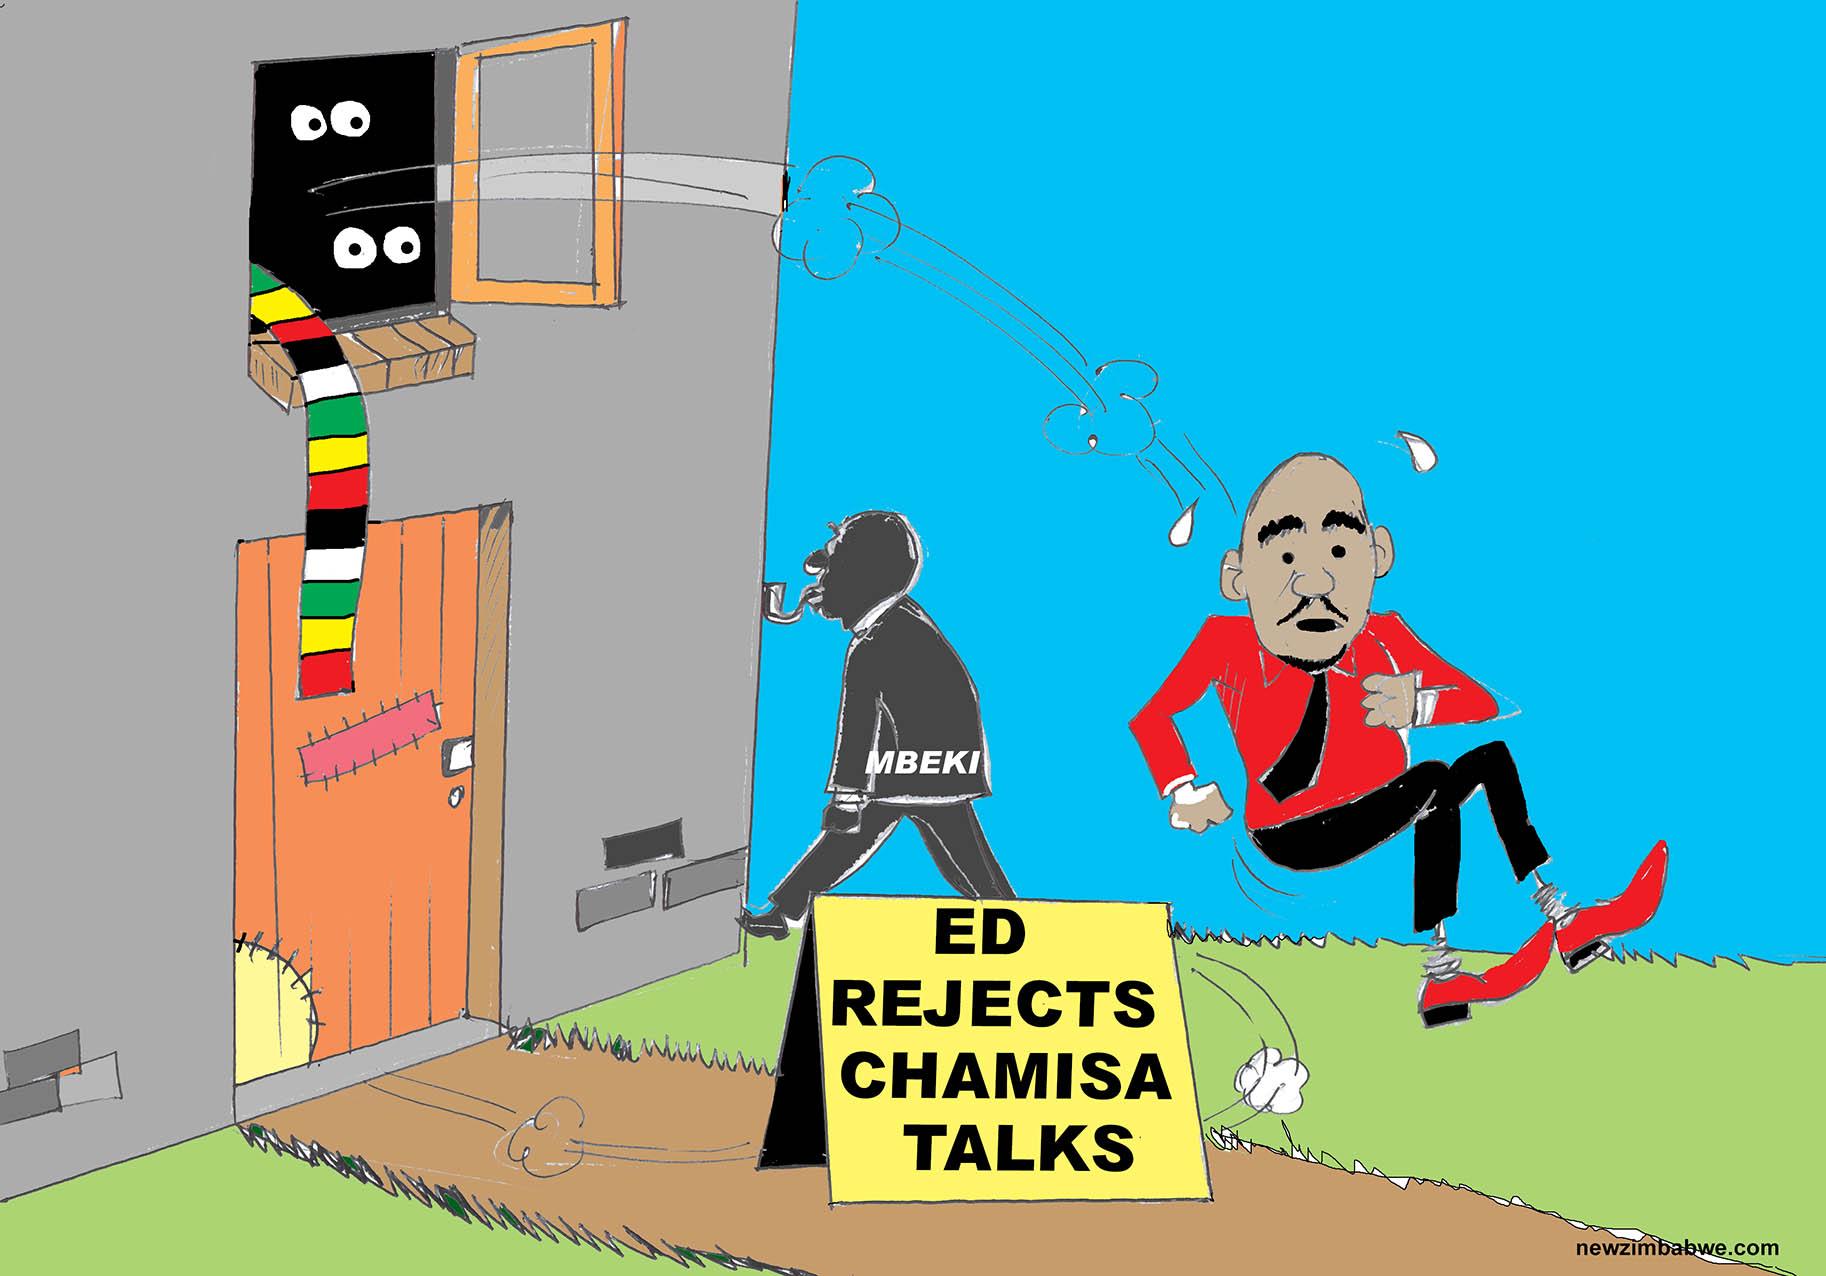 ED rejects Chamisa talks